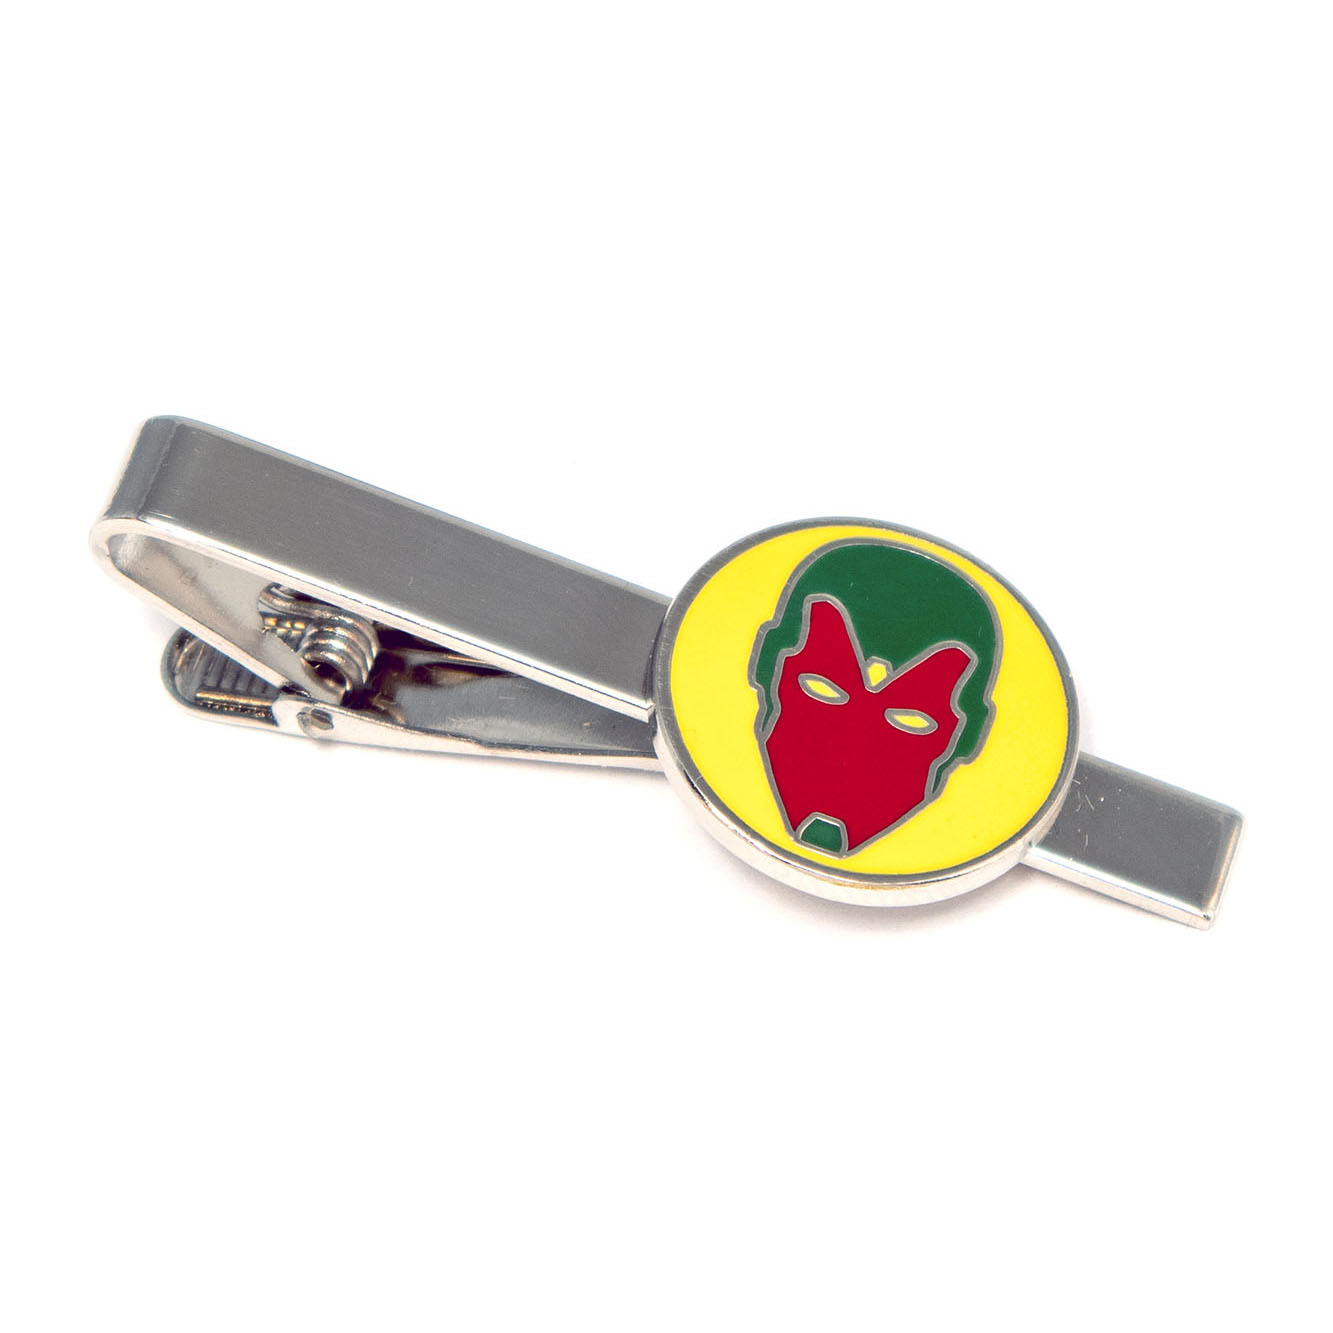 Marvel Vision Cufflinks, The Avengers Tie Clip Tack, Arc Reactor Jewelry,  Geek Comic Book Wedding Cuff Links, Groomsmen Jewelry from SharedImagination